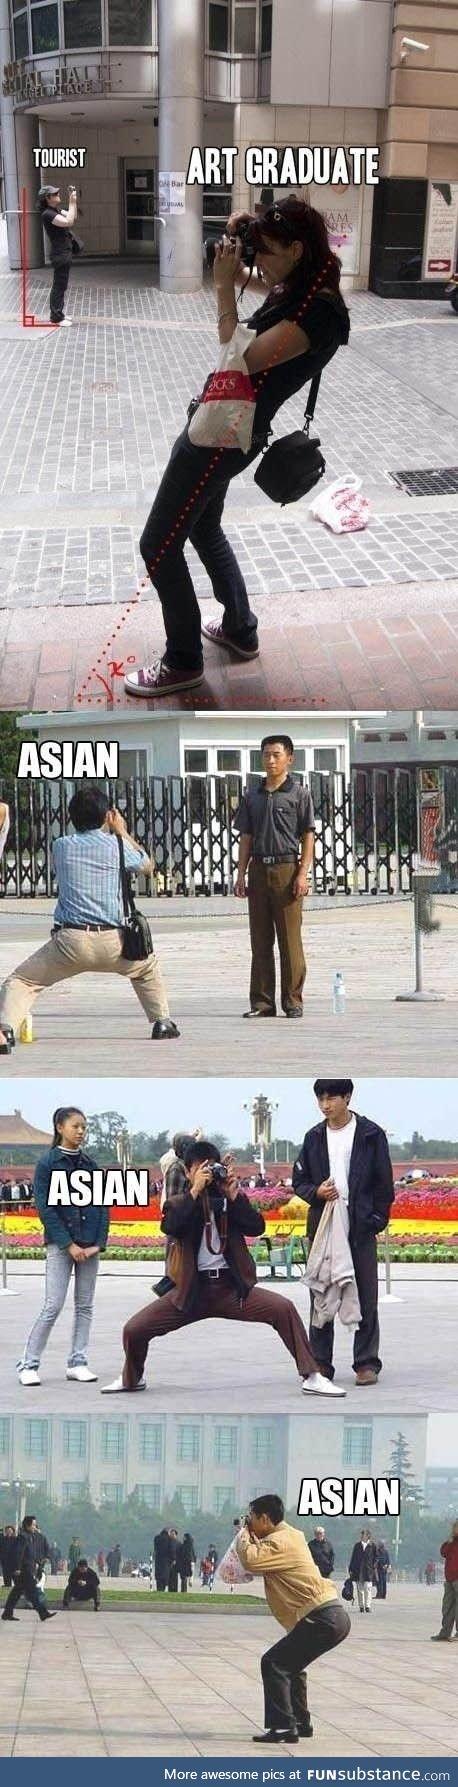 Photography: Tourist vs. Arts graduate vs. Asian